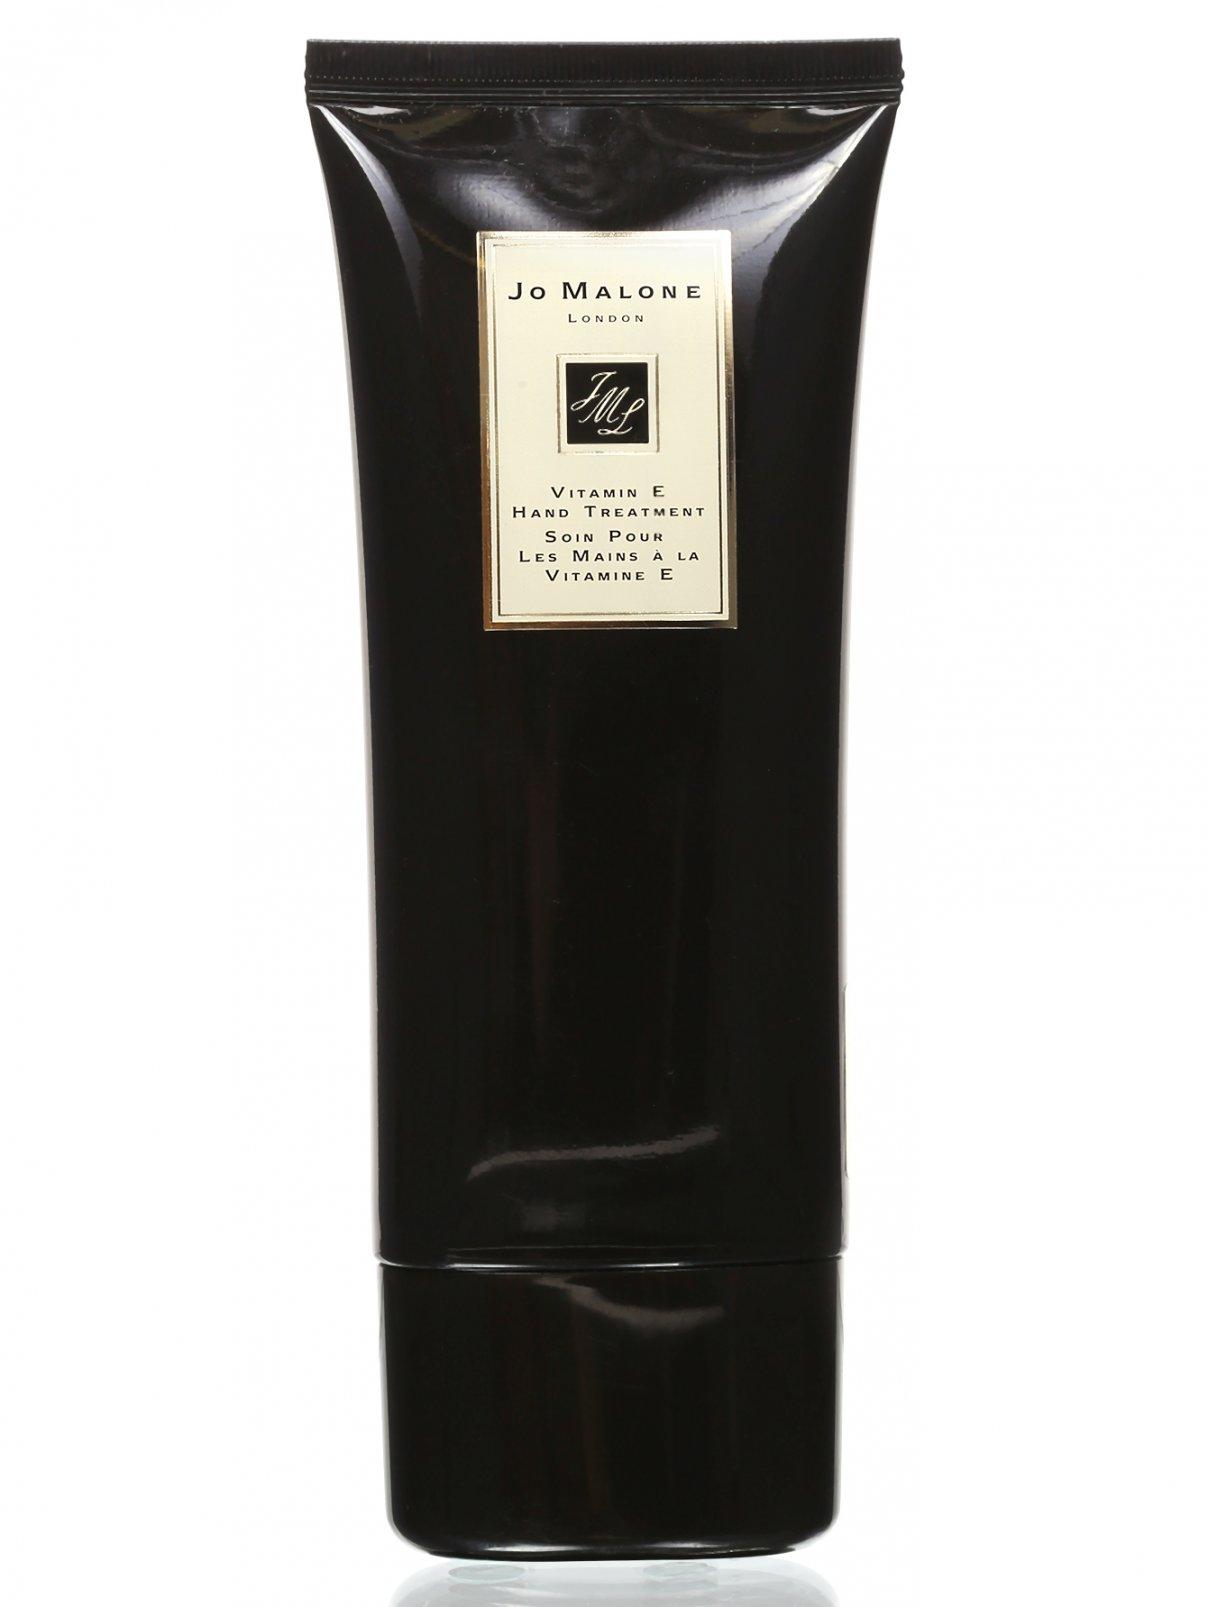 Питательный крем для рук - Vitamin E, 100ml Jo Malone London  –  Общий вид